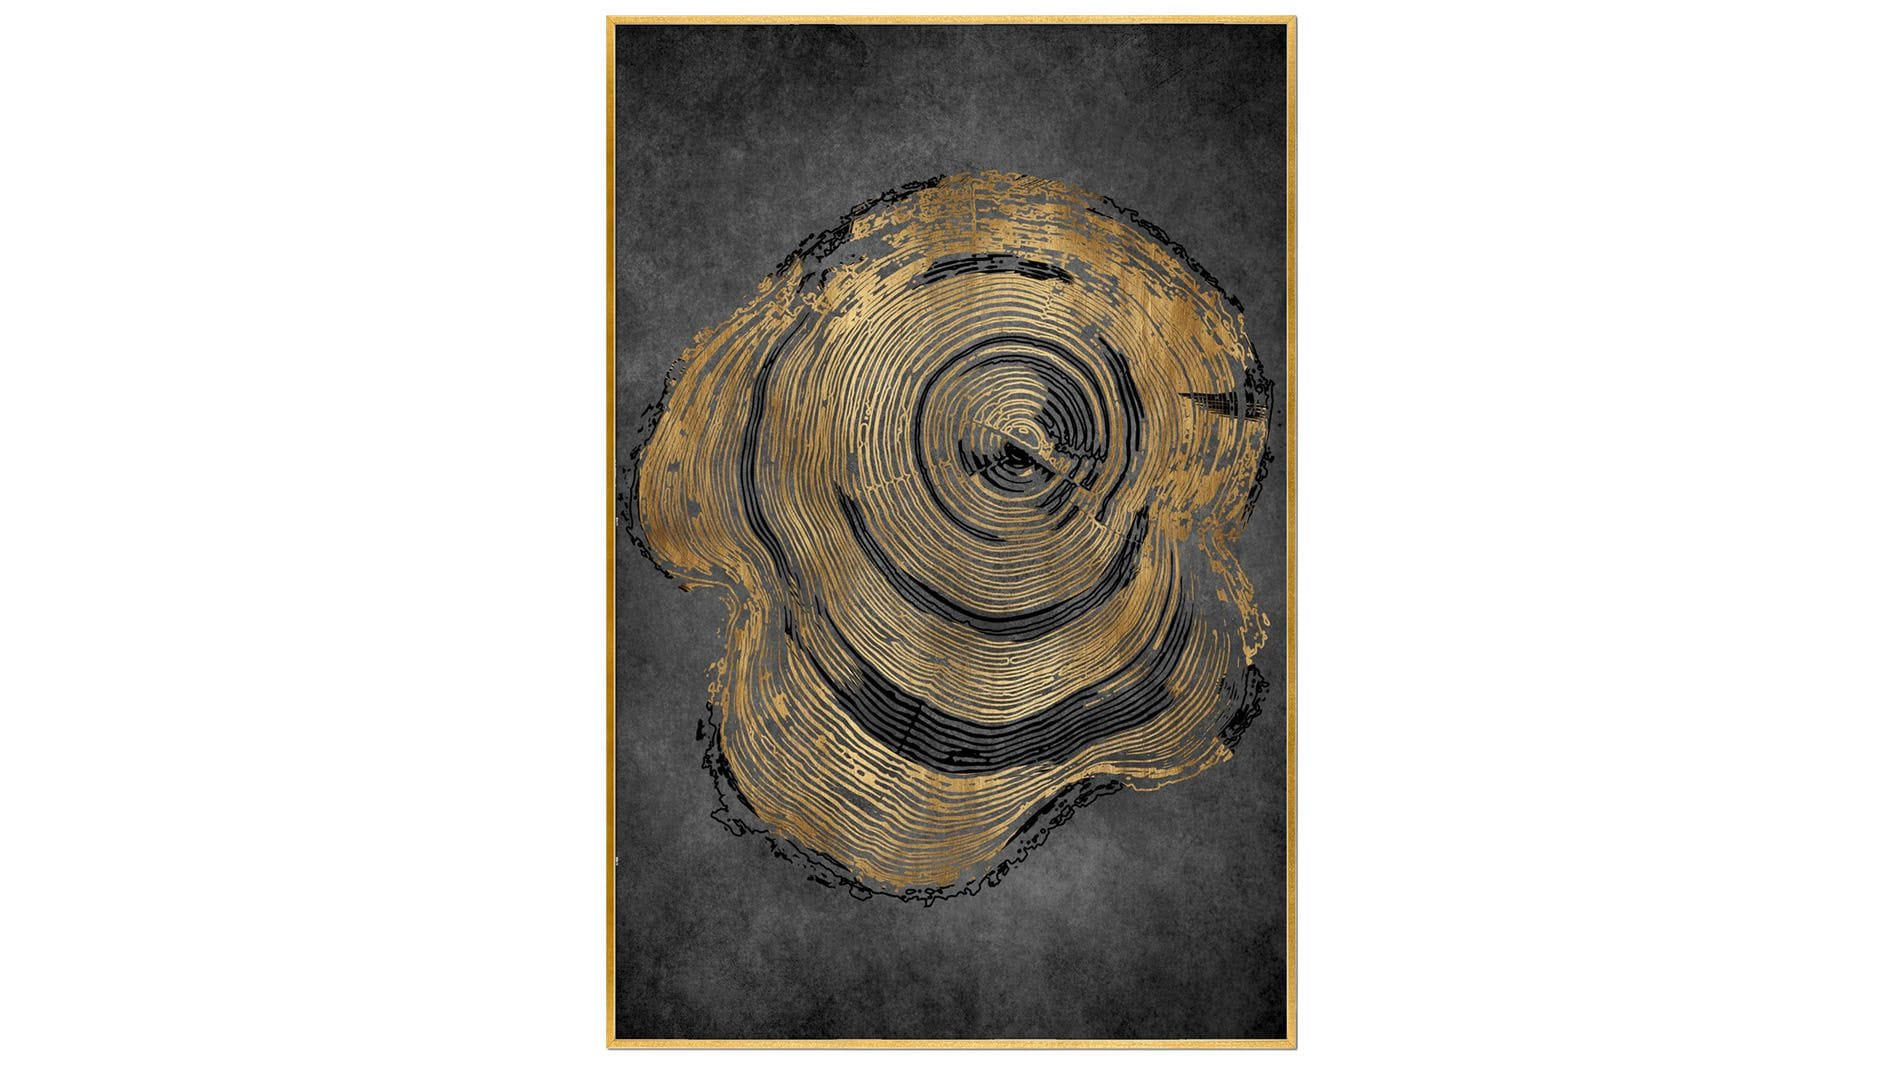 Постер для интерьера кольца дерева 60х80 см